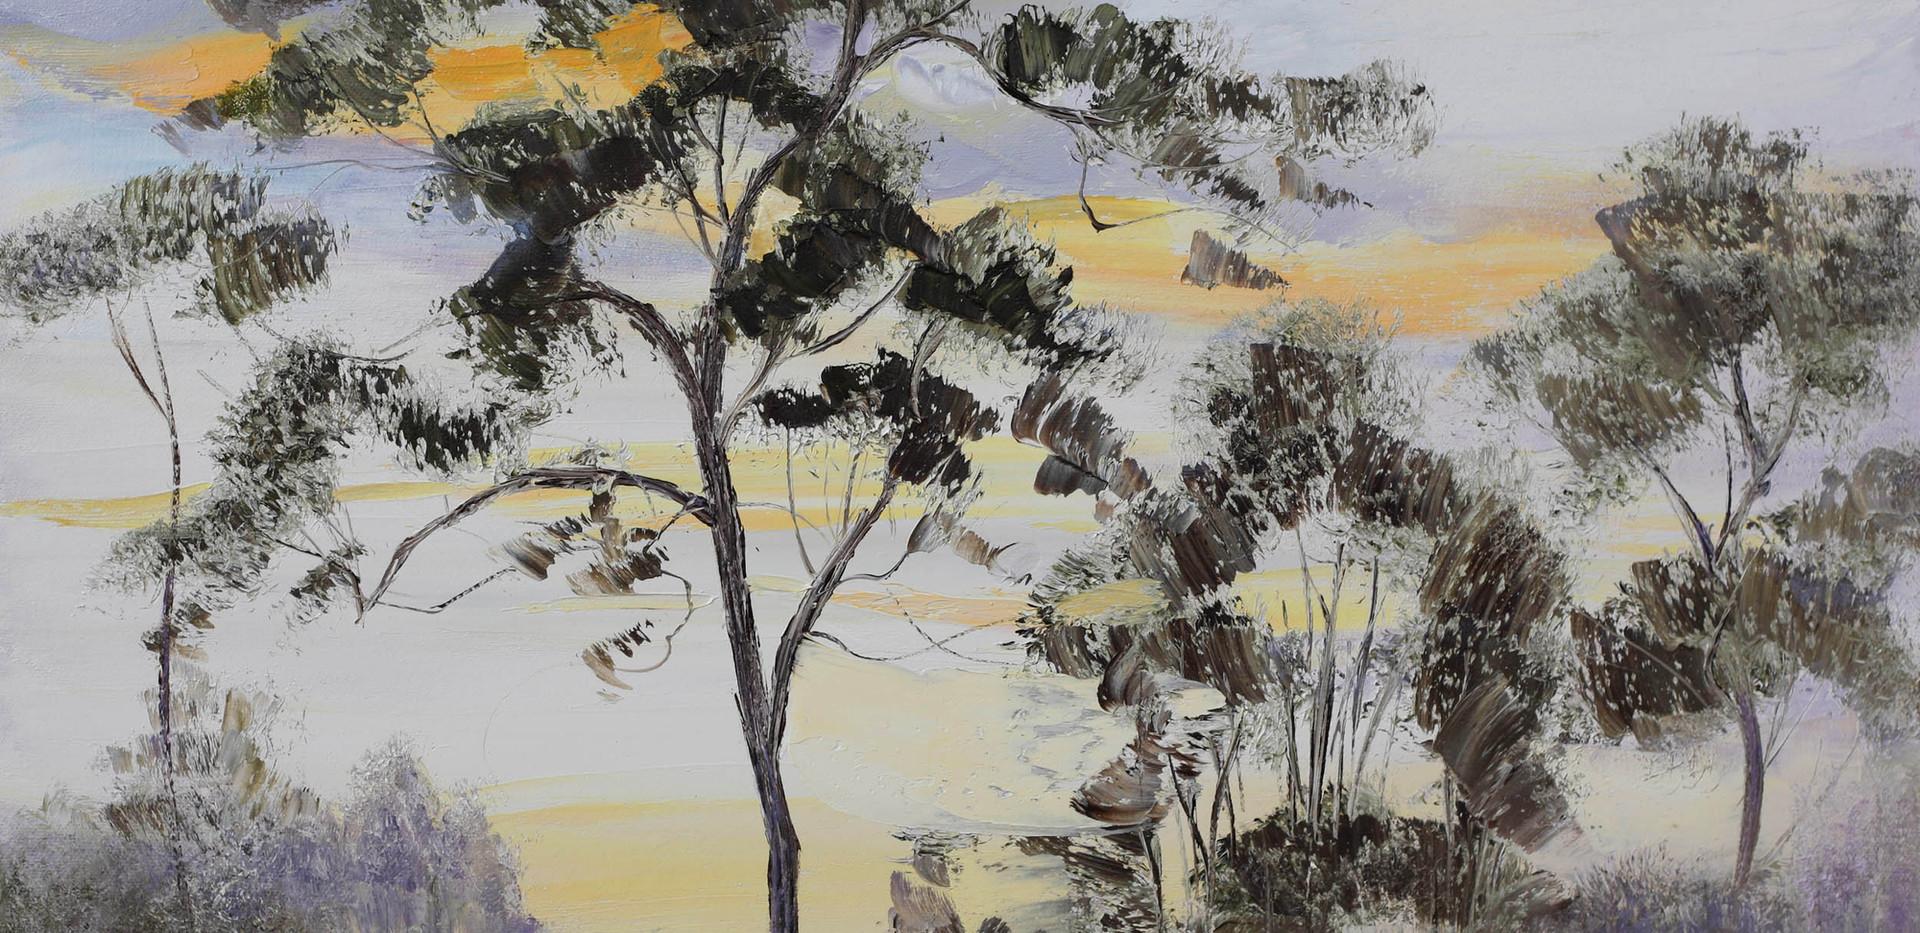 Karri Tree Silhouette 61cm x 51cm SOLD